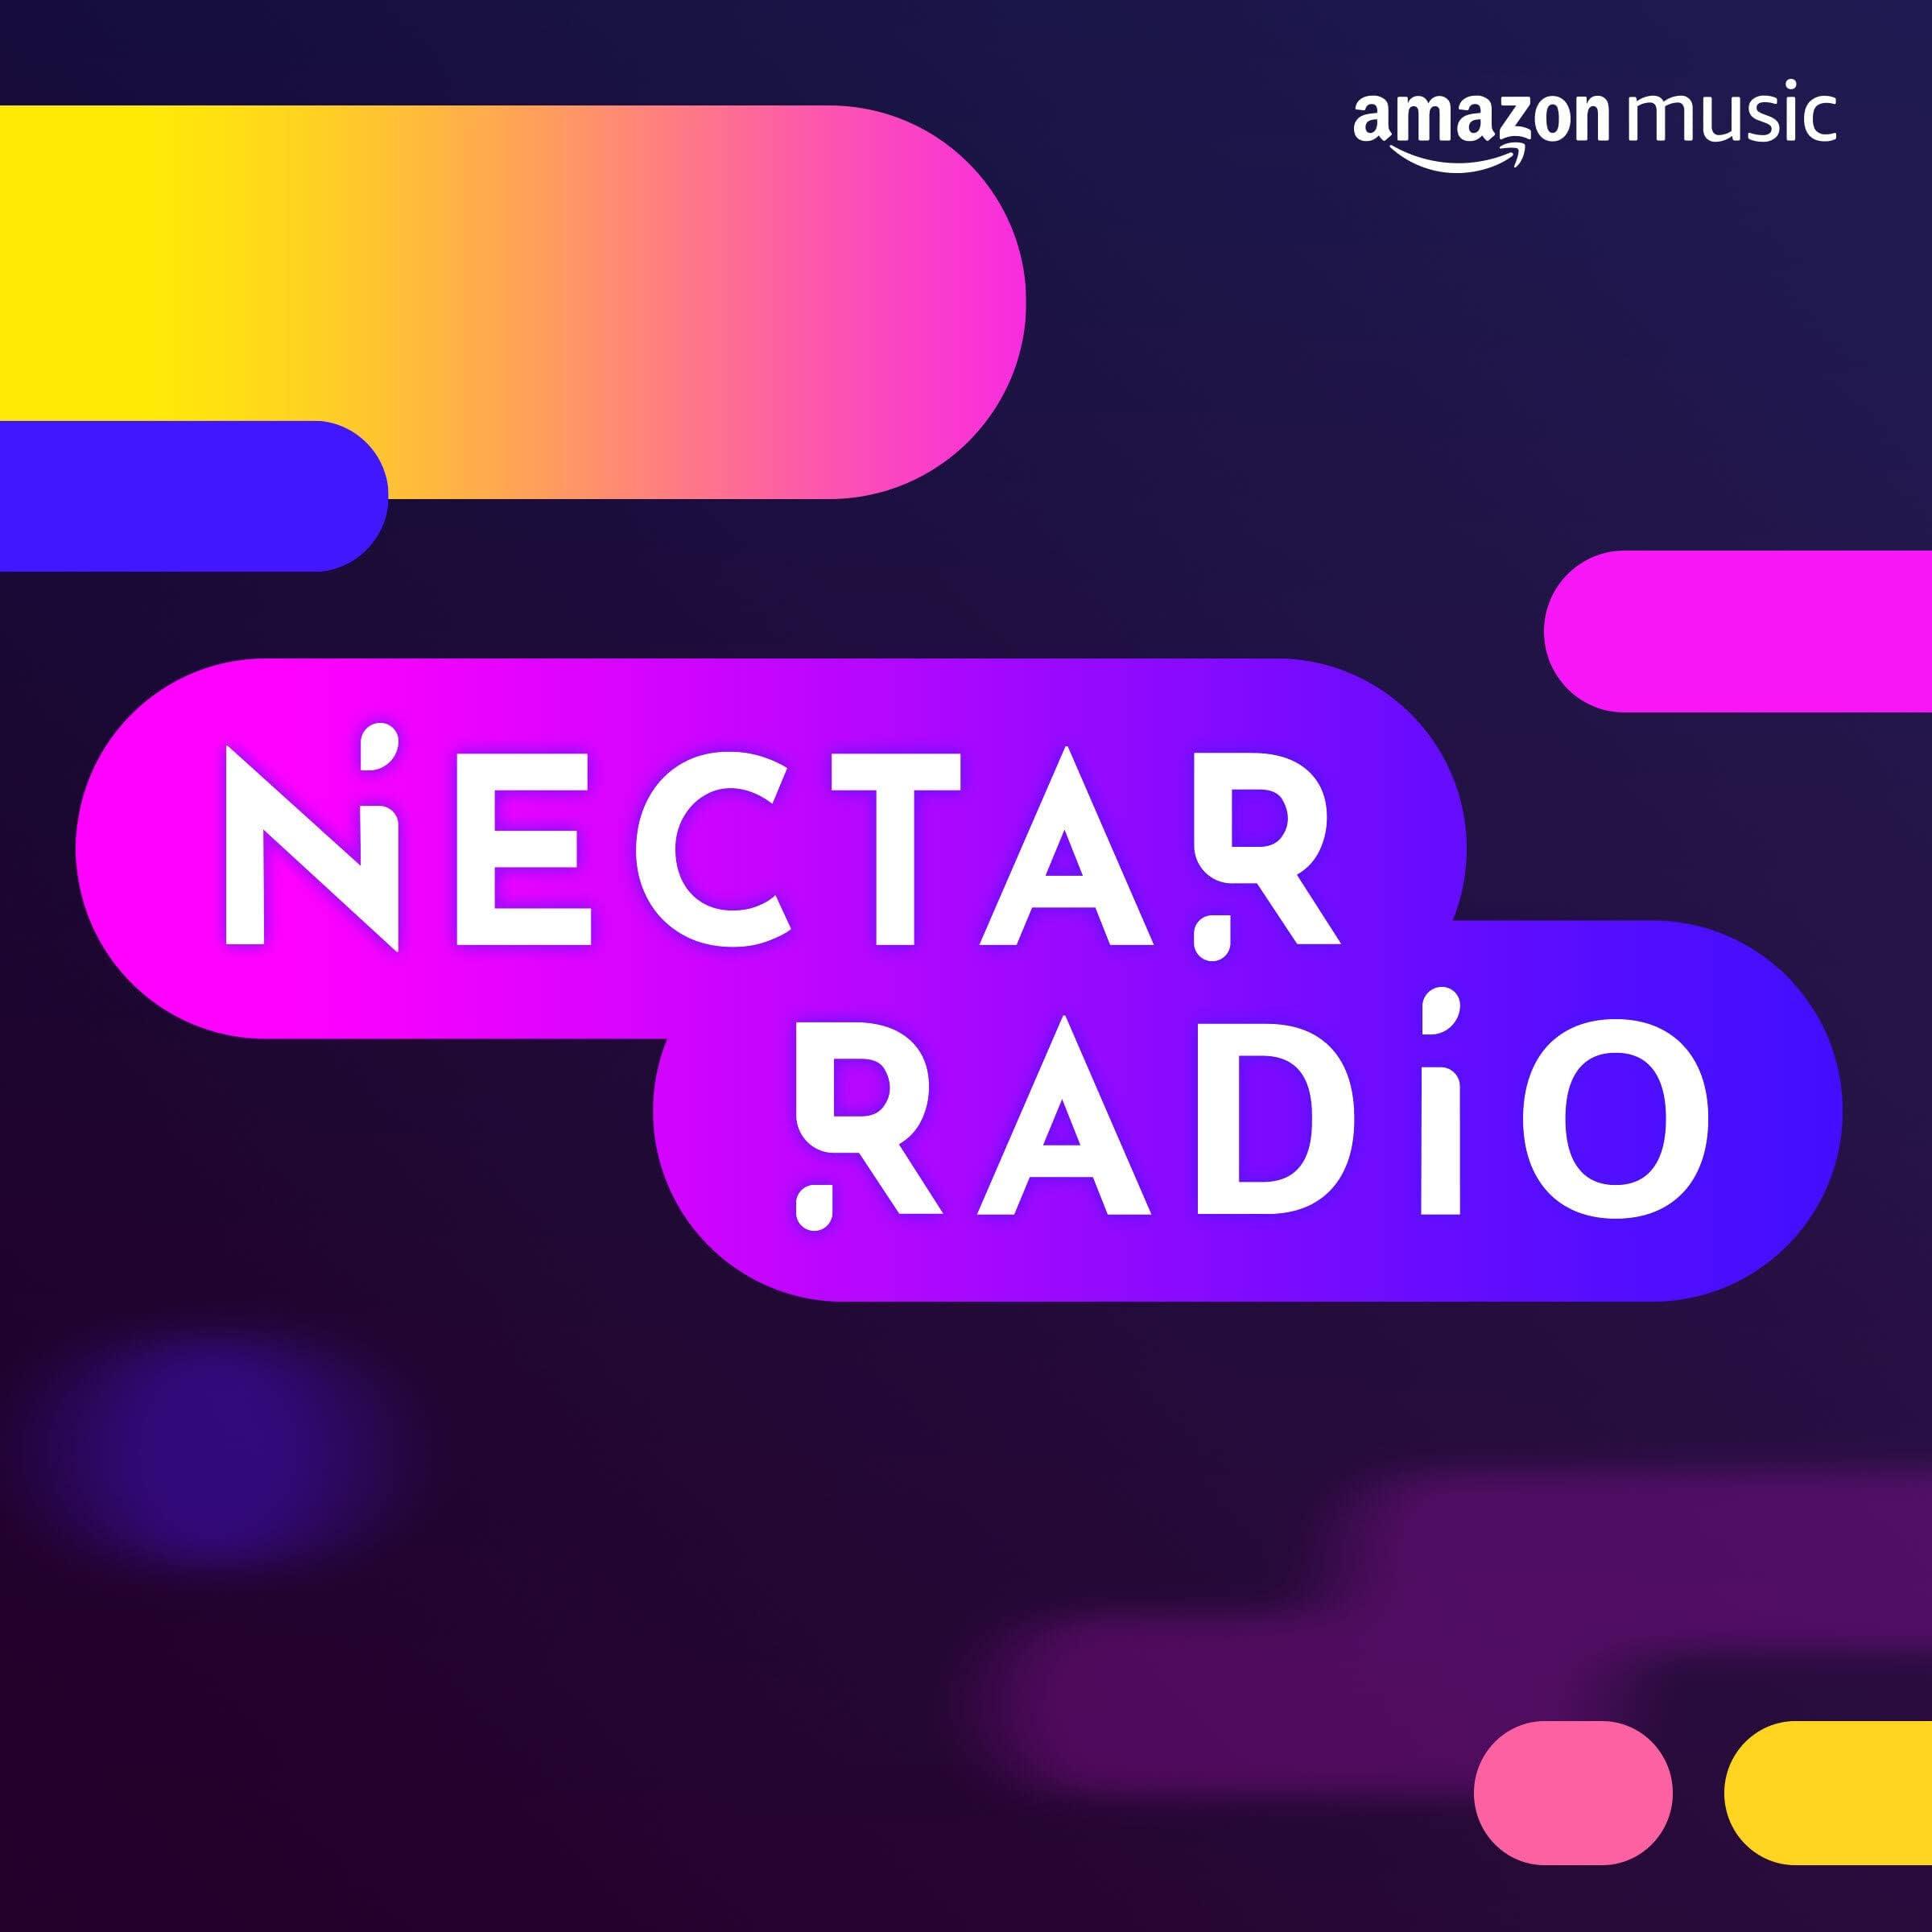 Nectar Radio